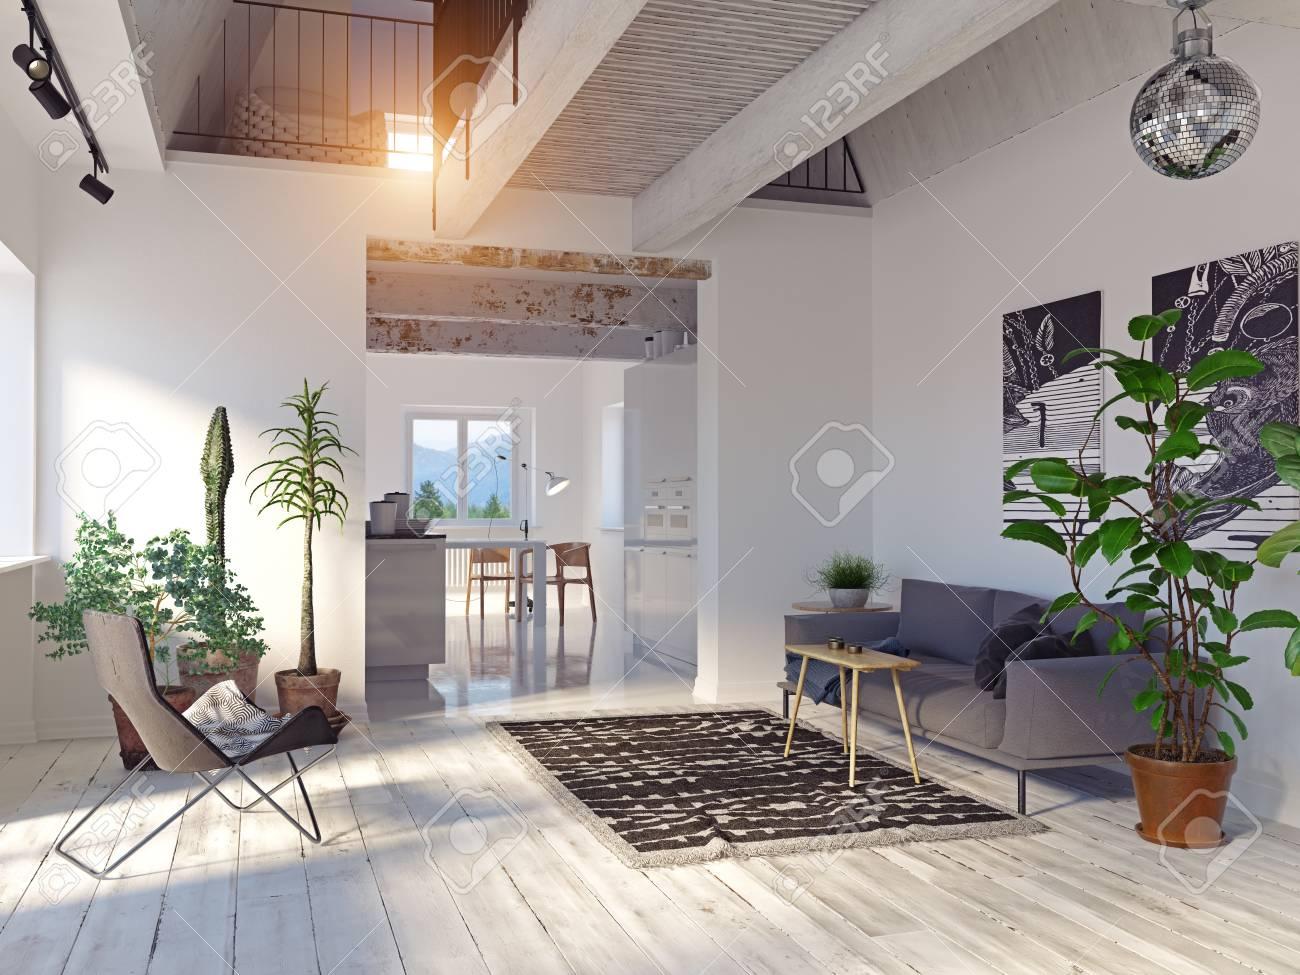 Modern house interior. Sofa and kitchen zone. - 121241182